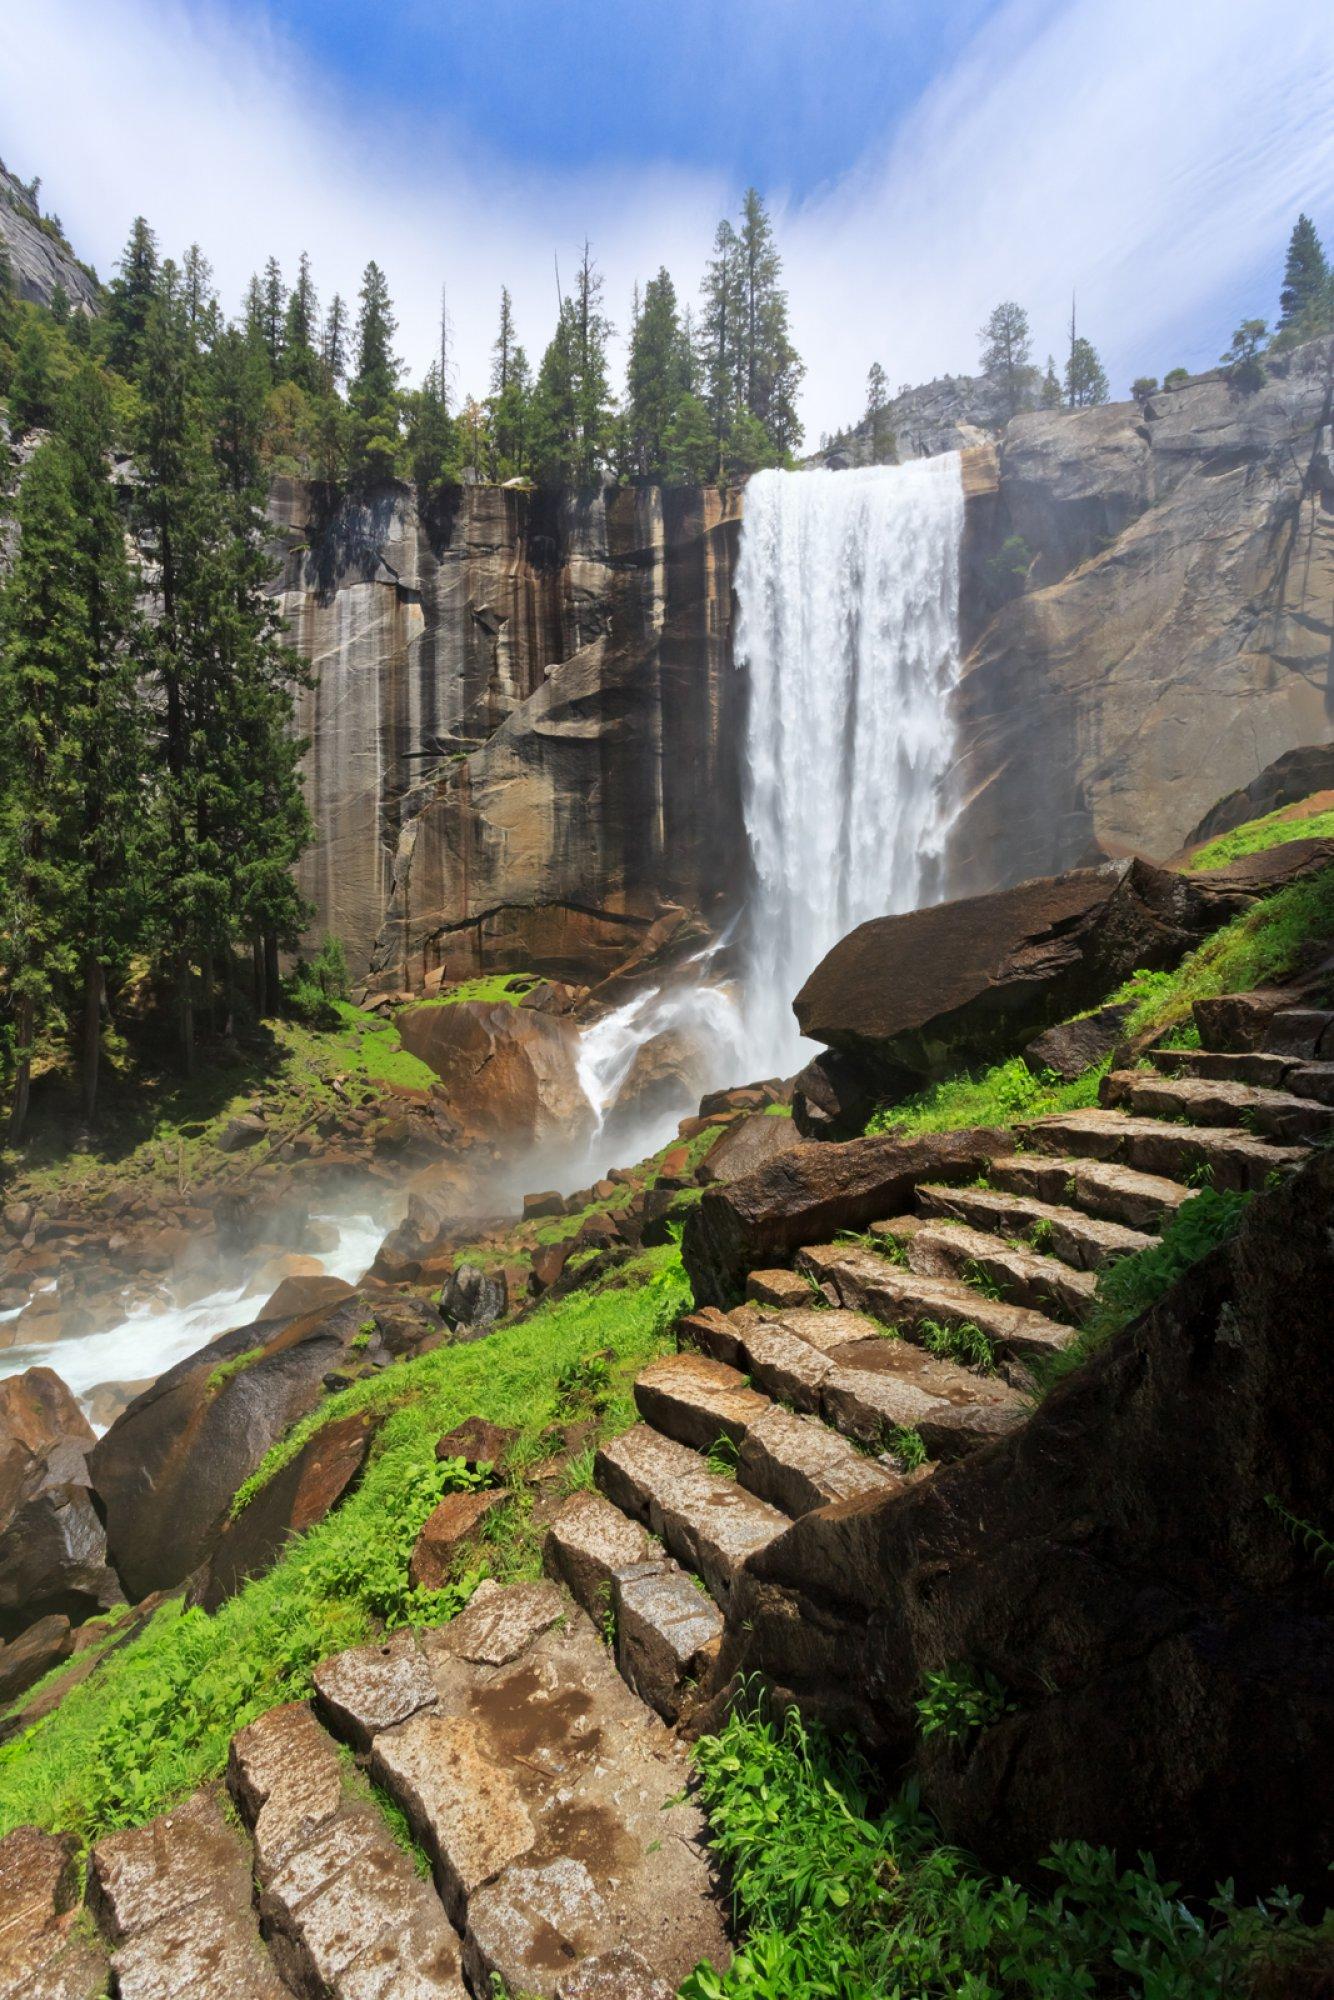 https://bubo.sk/uploads/galleries/16241/yosemity-vernal-falls.jpg